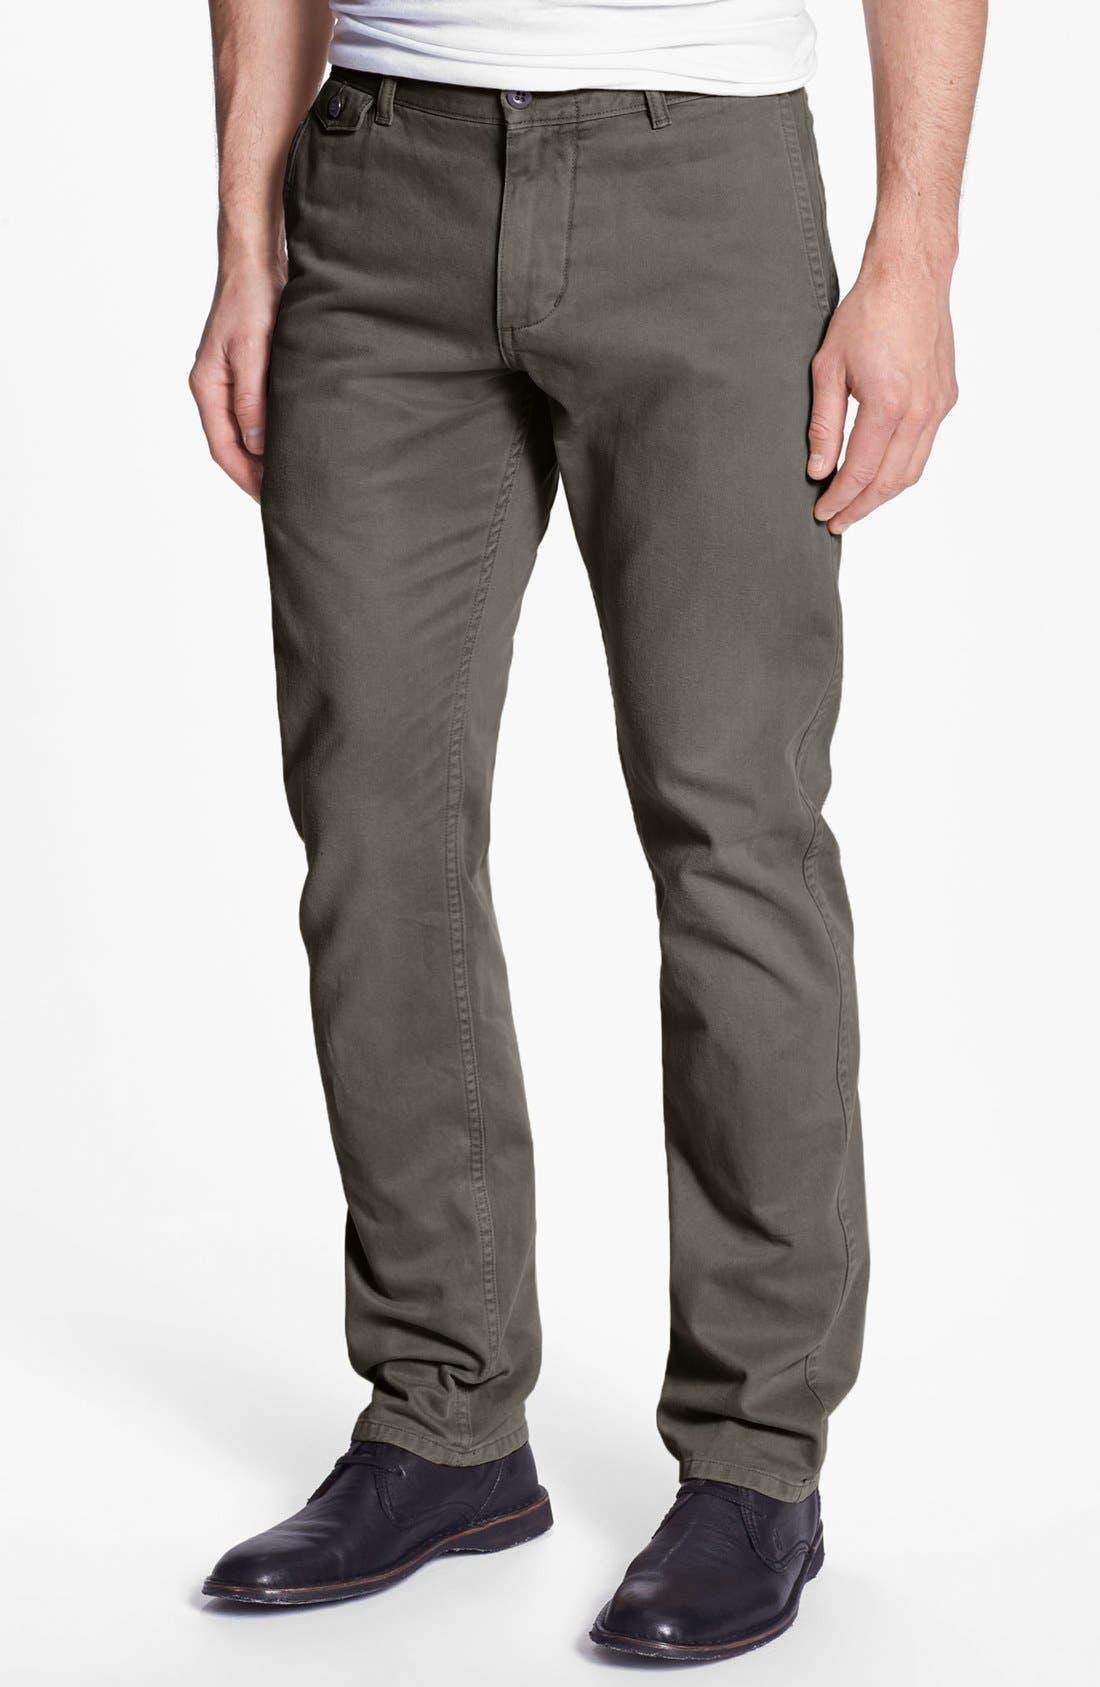 DOCKERS<SUP>®</SUP> 'Alpha Fogwash' Slim Tapered Leg Chinos, Main, color, 038